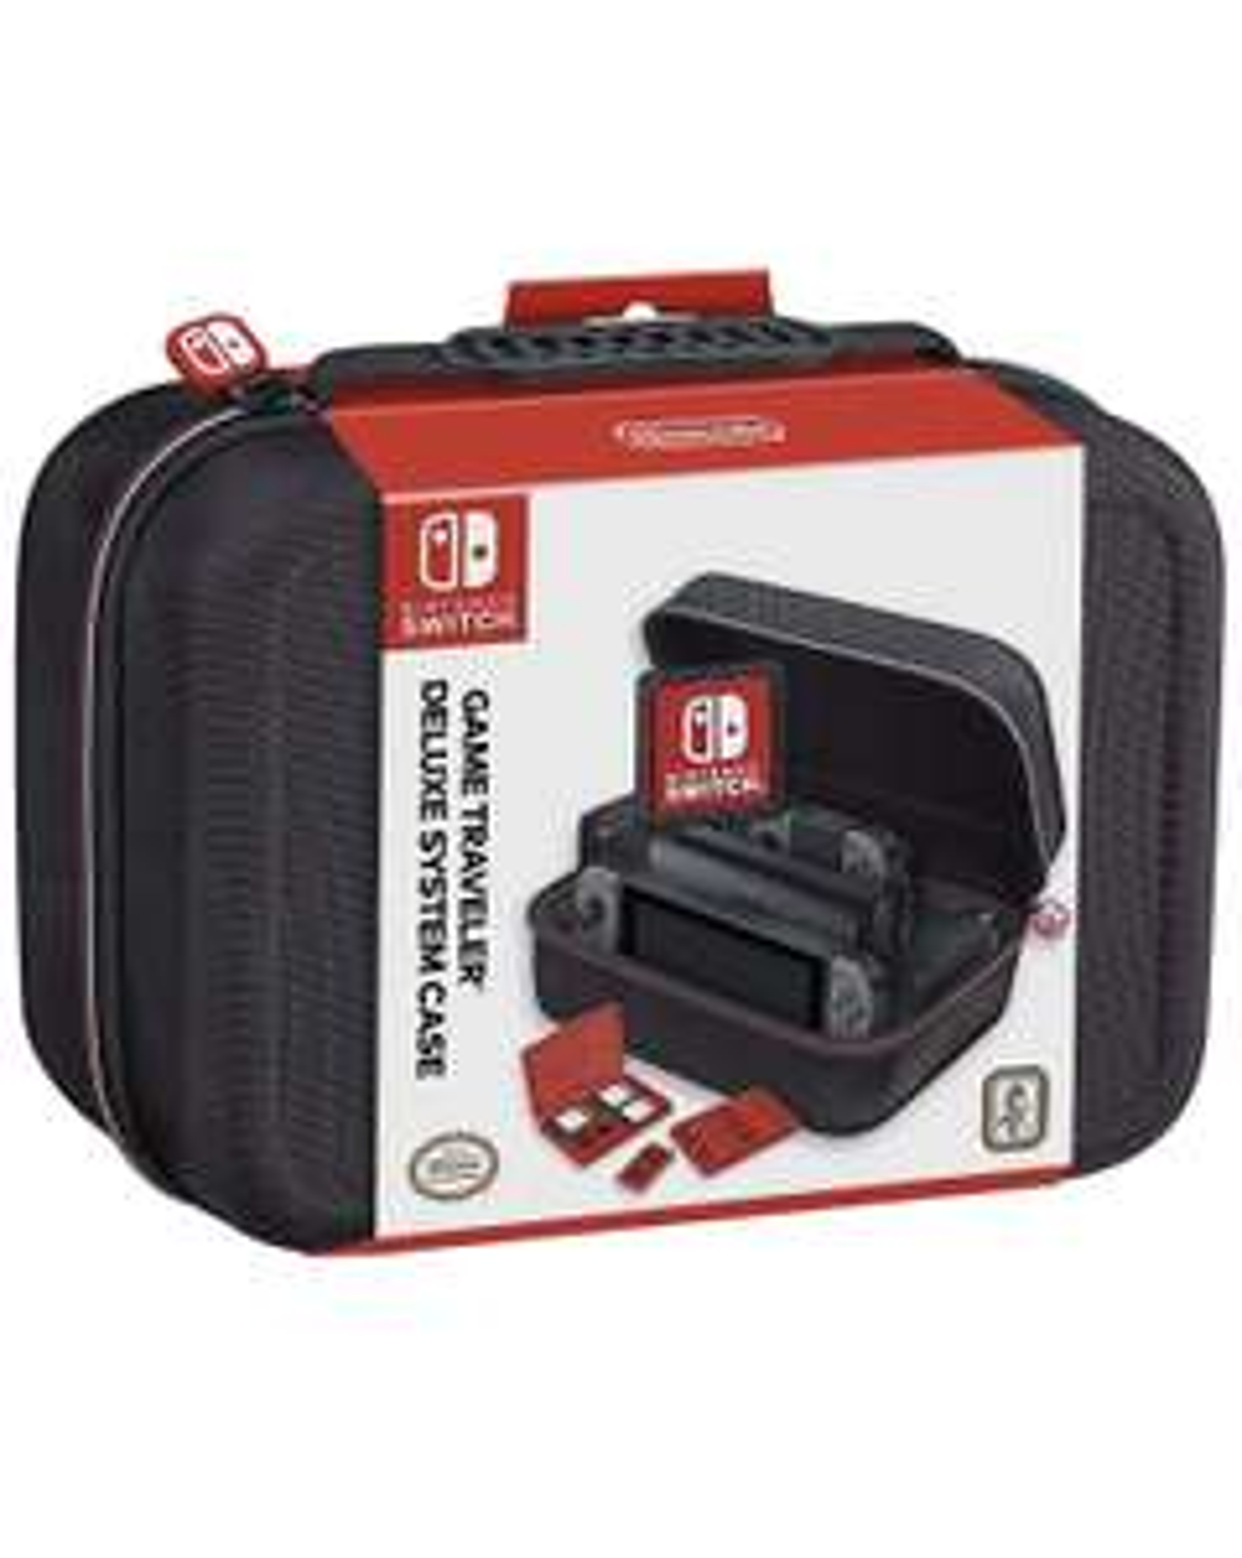 Valise de transport BigBen Game traveler Deluxe system case pour Nintendo Switch (Vendeur tiers)